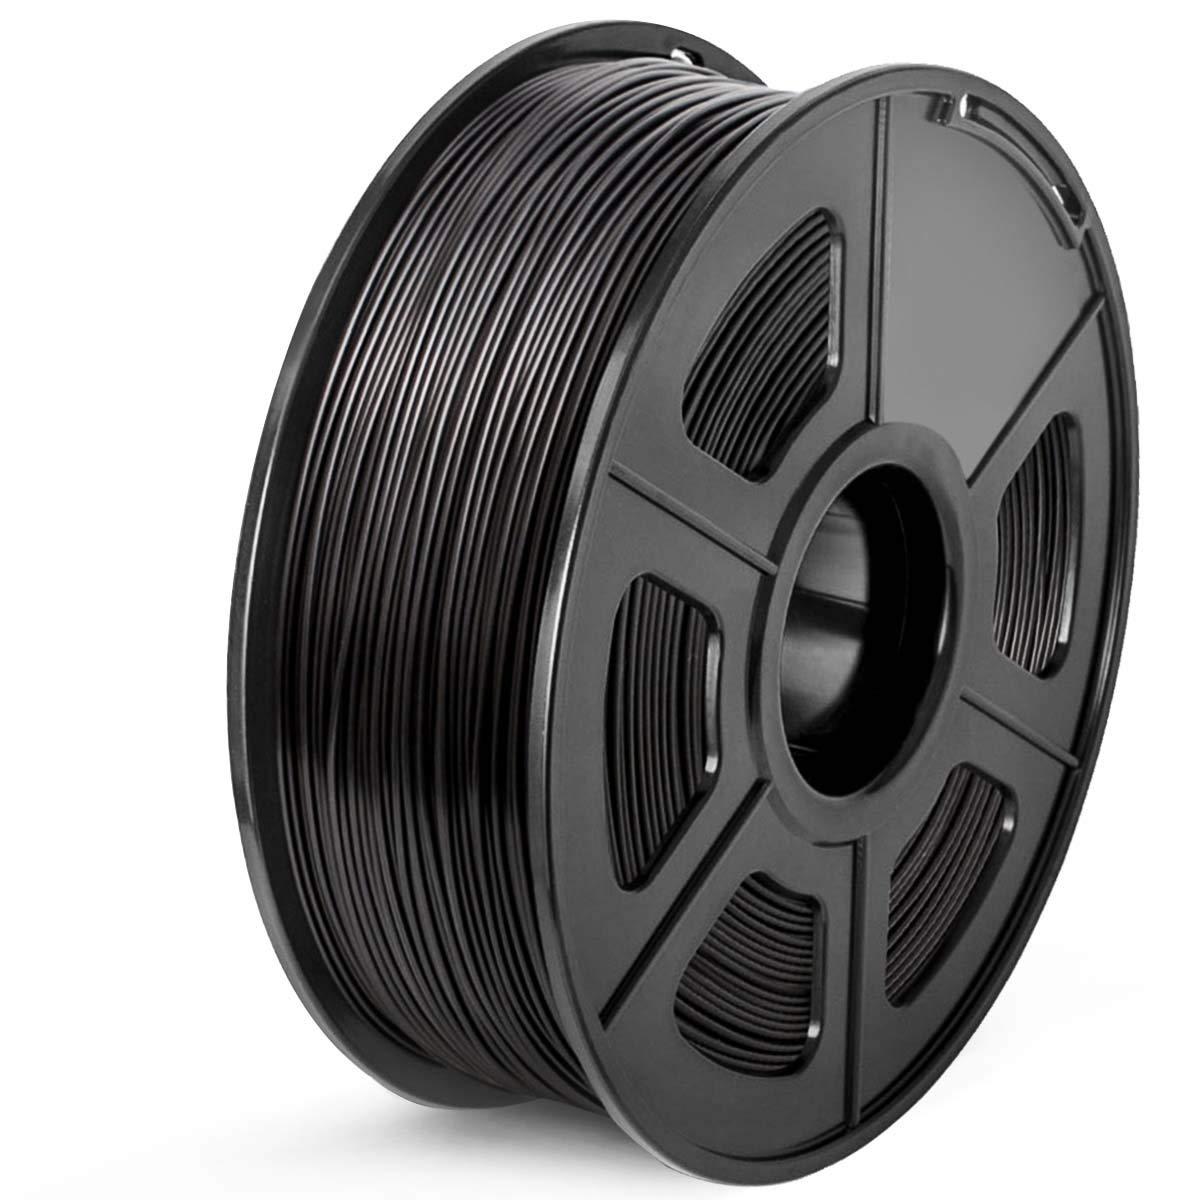 SUNLU ABS 3D Printer Filament, 1.75 ABS Filament Dimensional Accuracy +/- 0.02 mm, 1 kg Spool, 1.75mm, ABS Black